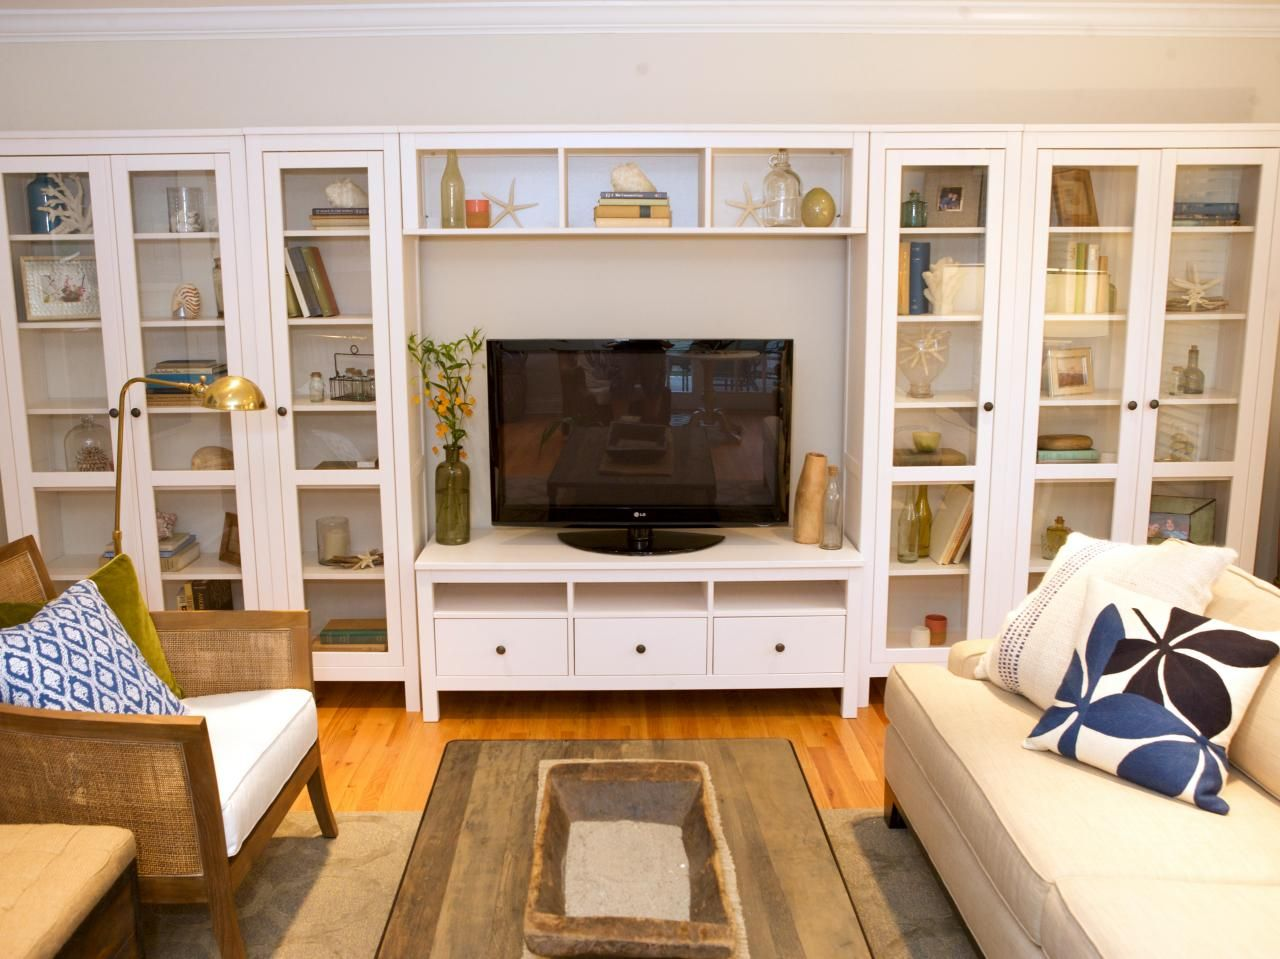 10 Beautiful Built-Ins and Shelving Design Ideas | Coastal living ...